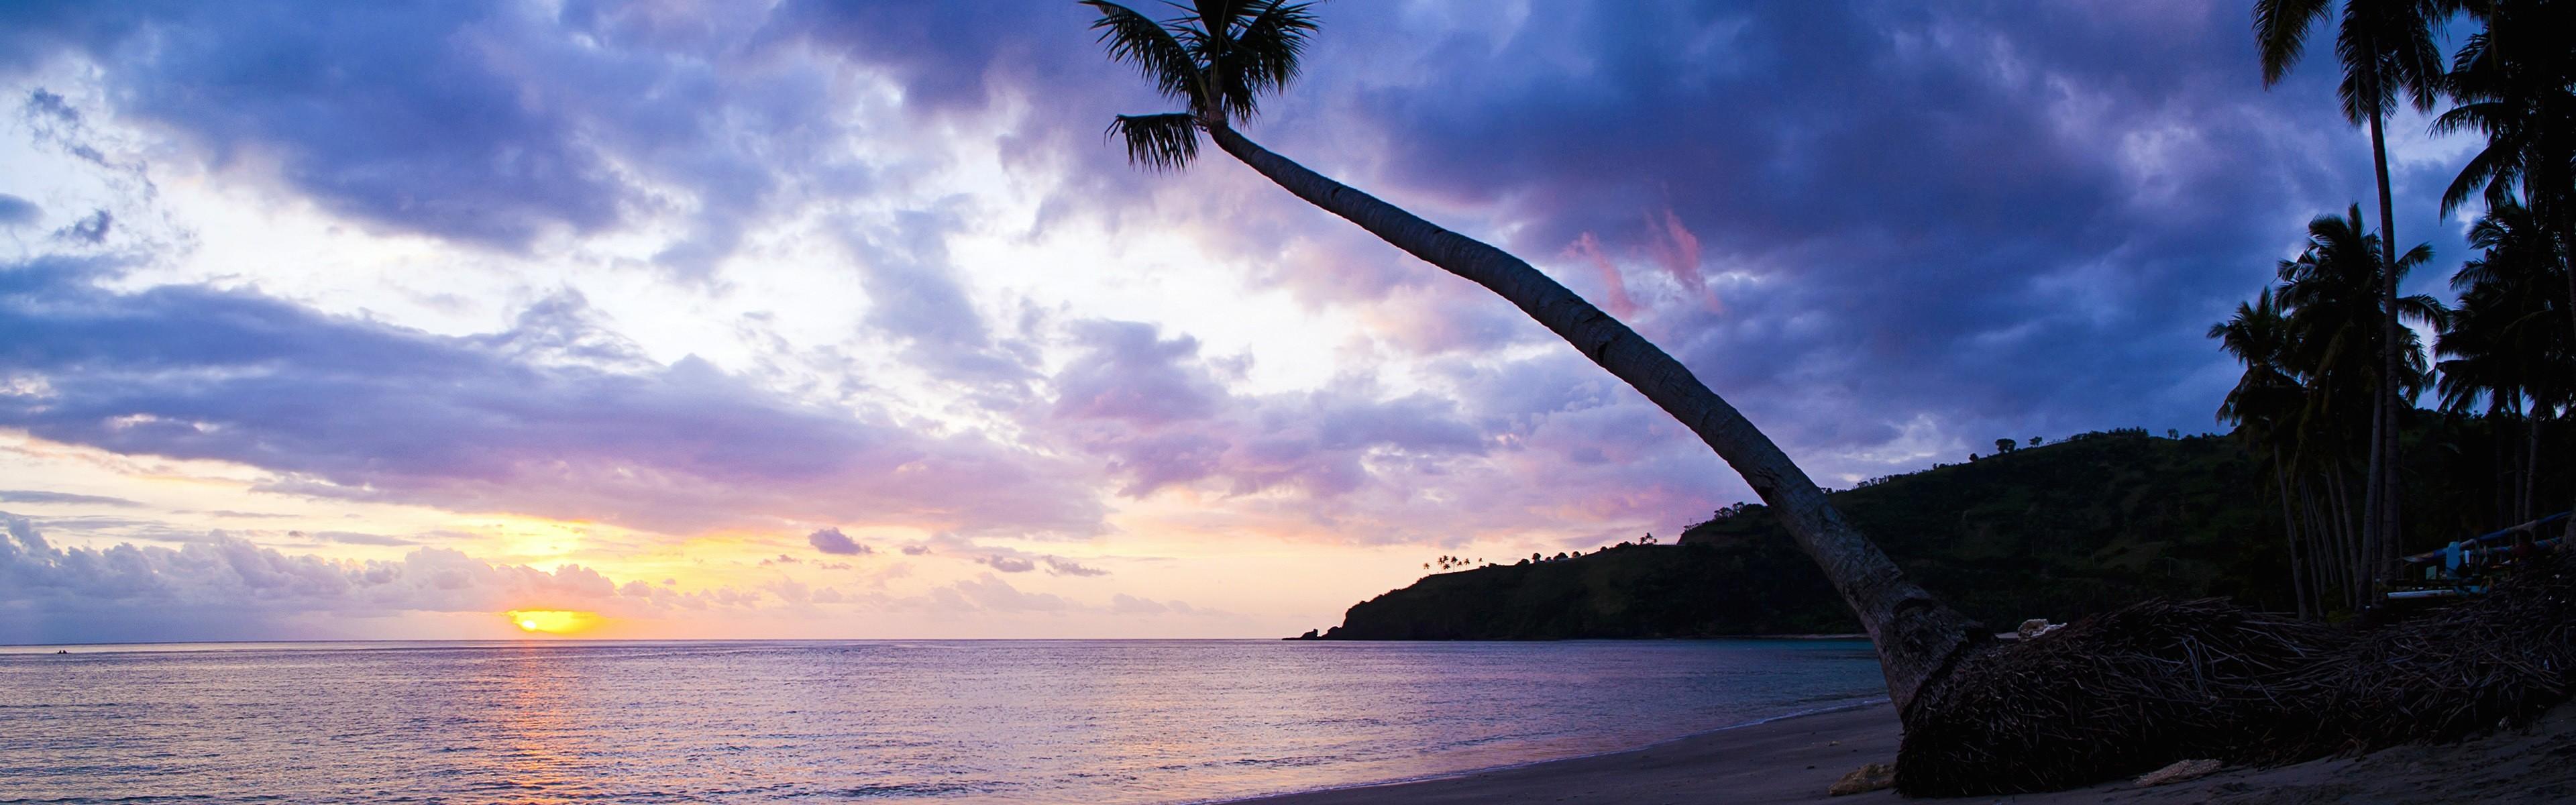 Beautiful beach sunset, Windows 8 panoramic widescreen wallpapers #8 –  3840×1200.